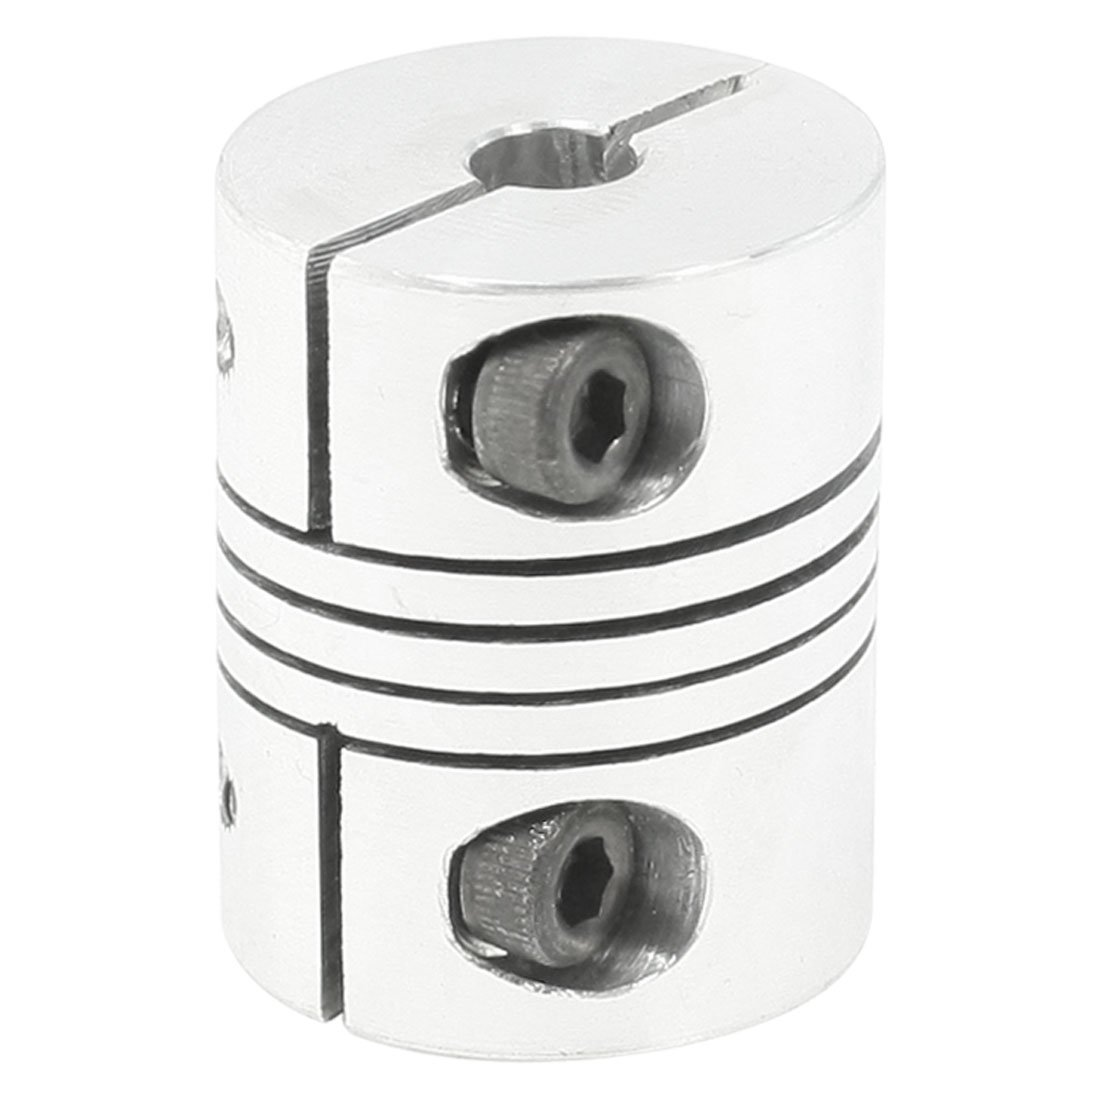 IMC Hot CNC Motor Shaft Coupler 5mm to 8mm Flexible Coupling 5mmx8mm flexible shaft coupling od18mmx25mm cnc stepper motor coupler connector 6 35 to 8mm